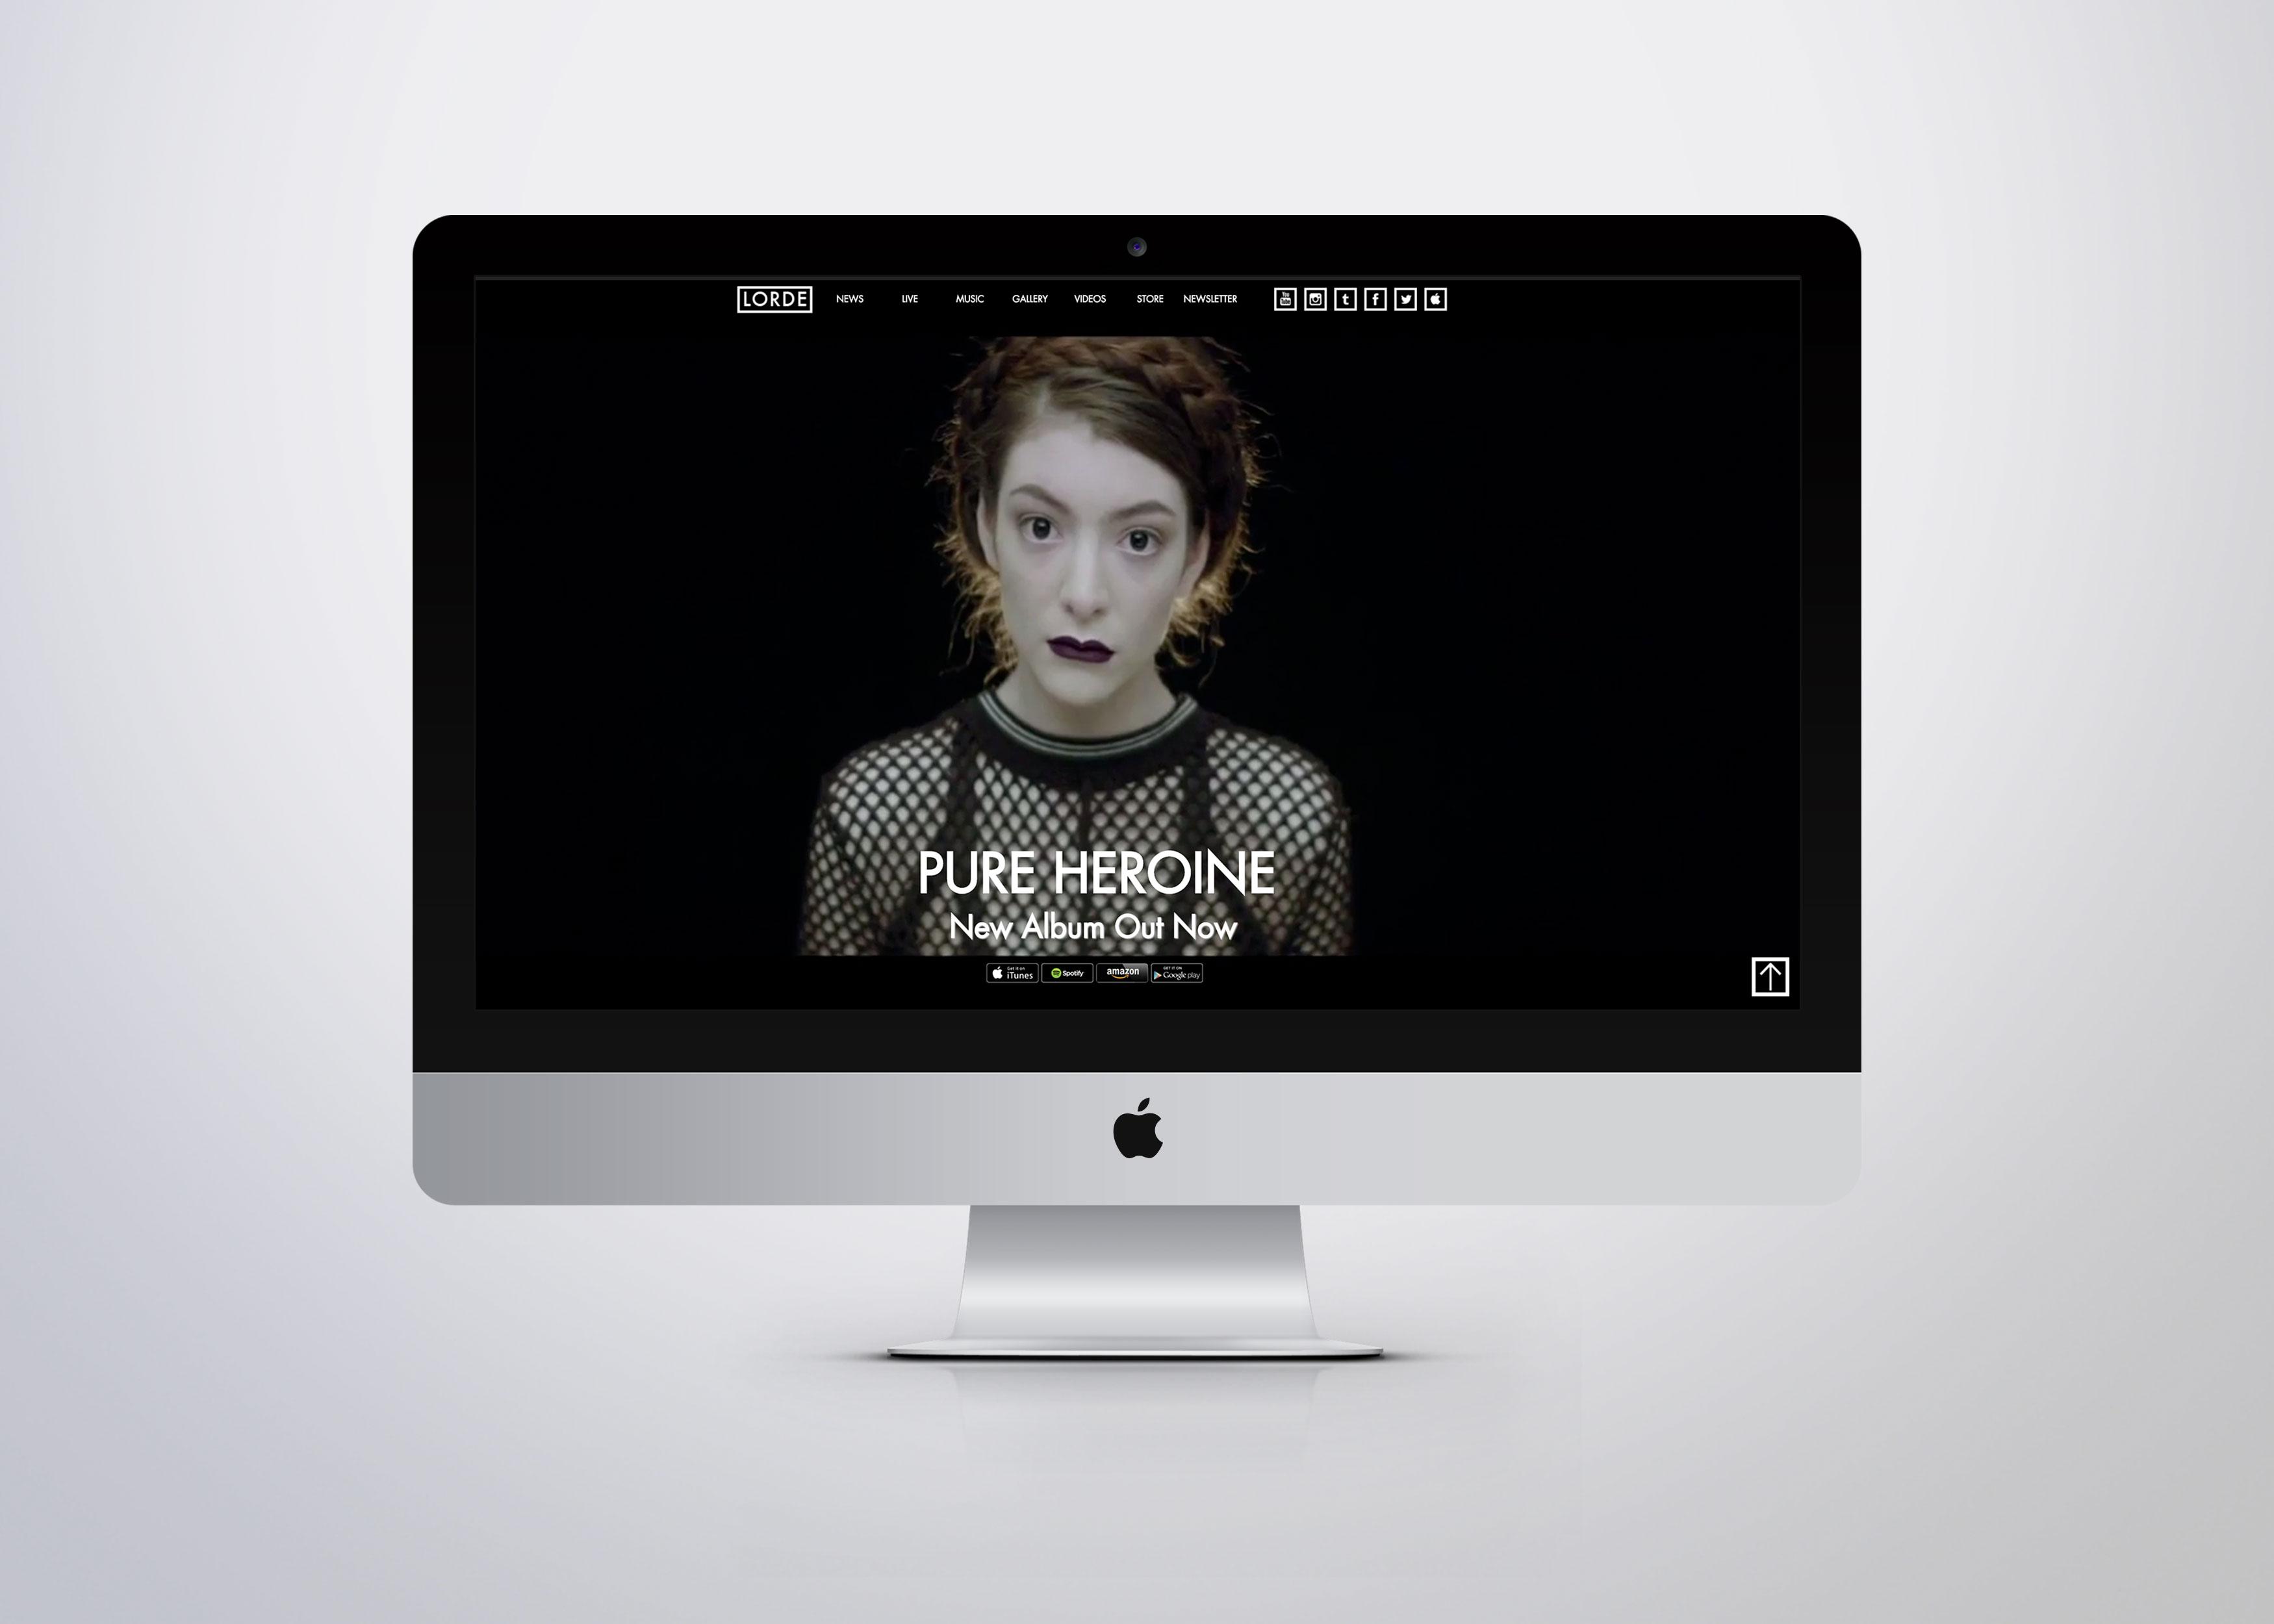 Web Lorde